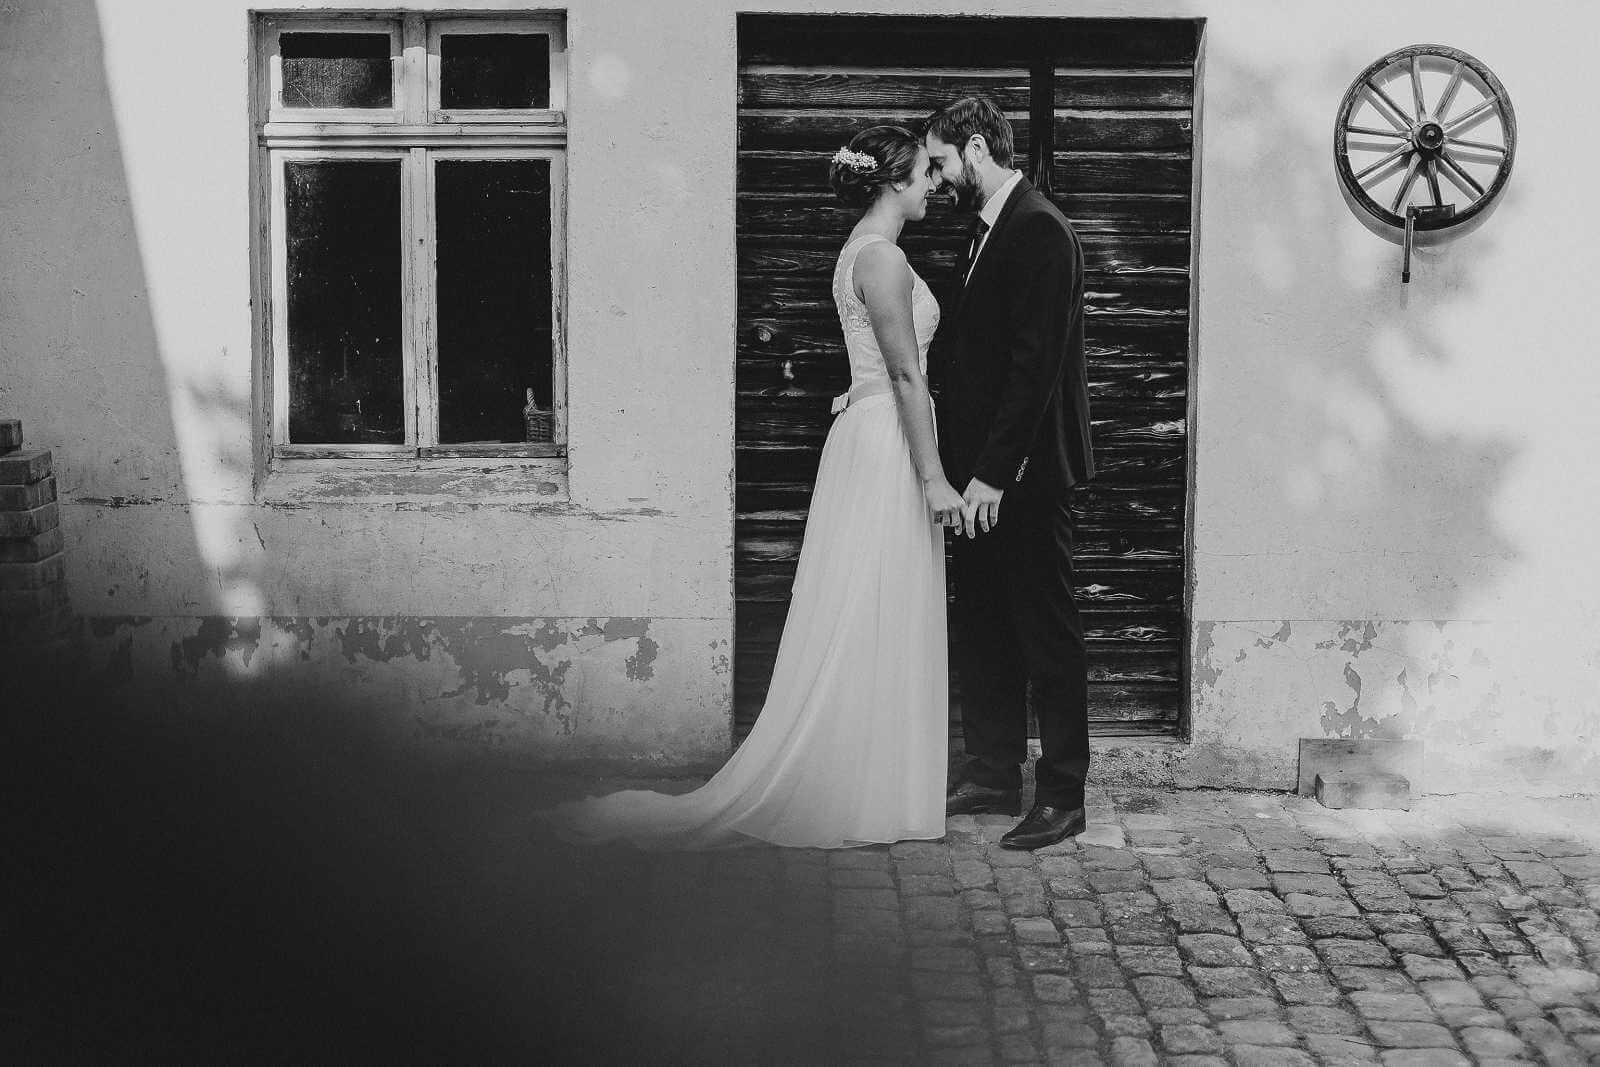 Hochzeitsfotograf Offenburg Zell am Harmersbach Bärenkeller (15)